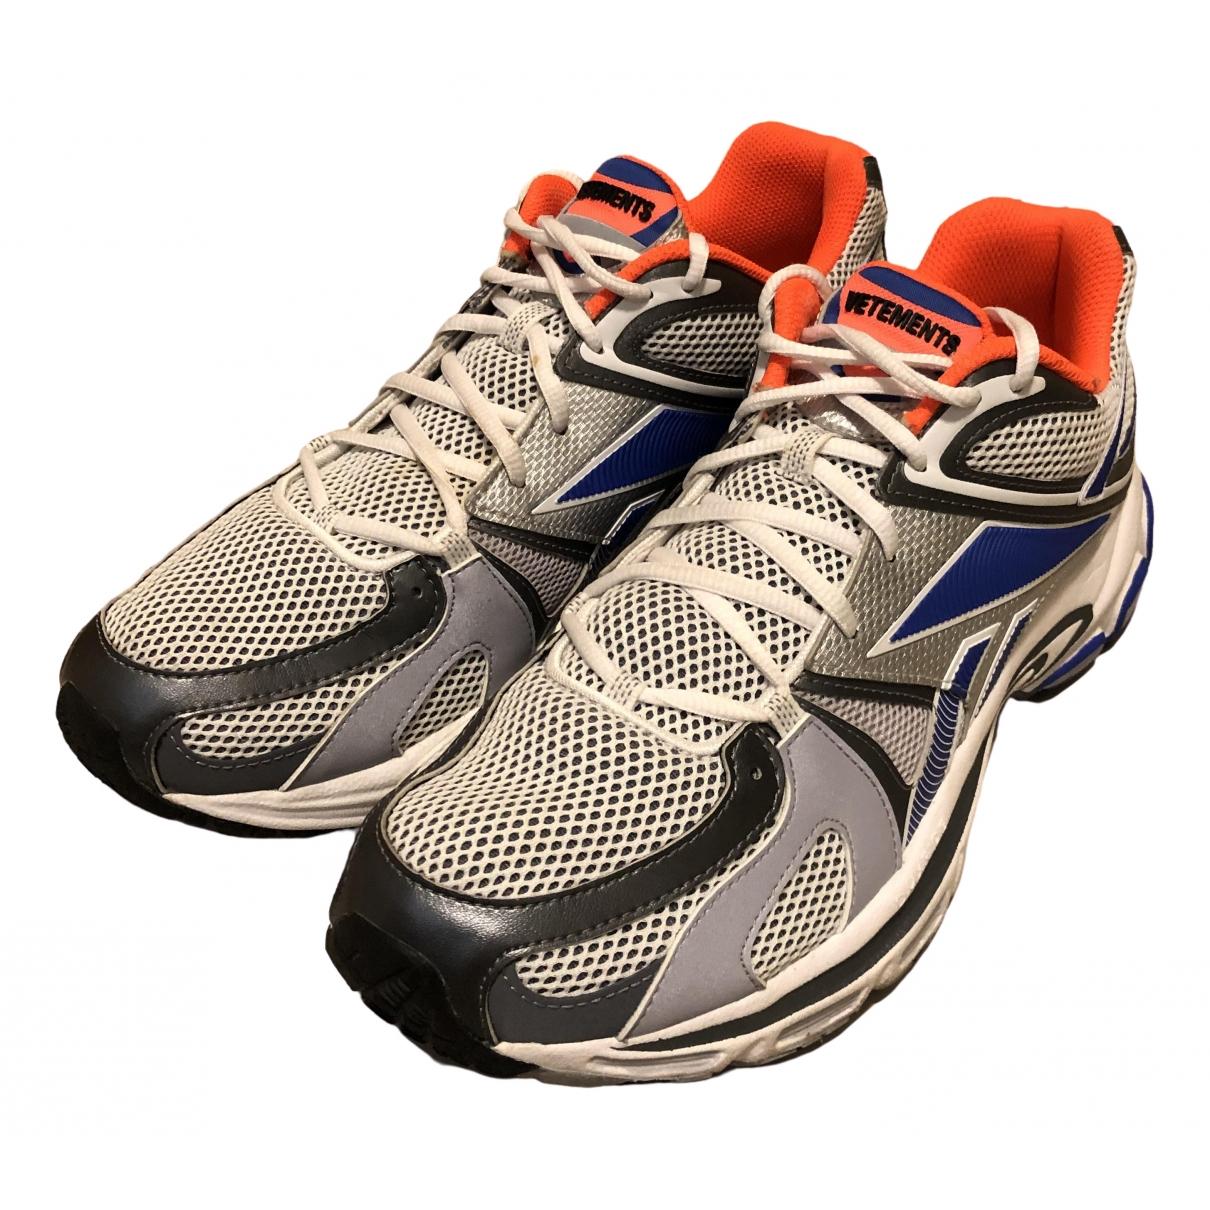 Reebok X Vetements \N Silver Cloth Trainers for Men 43 EU